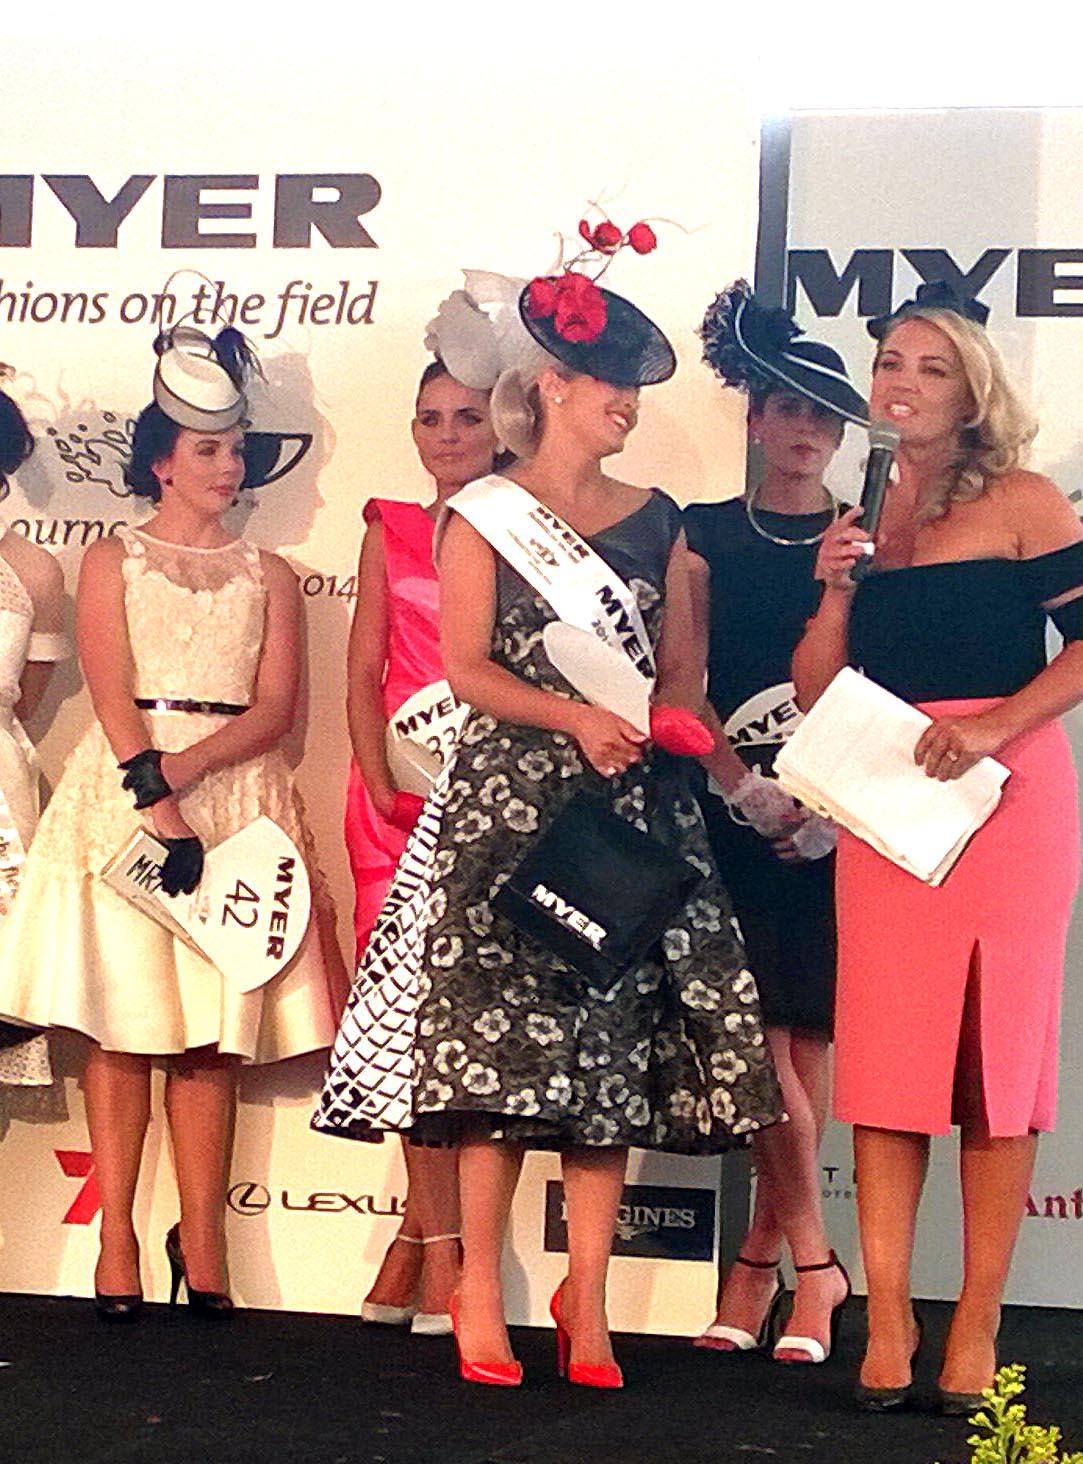 The winner, Nikki Gogan, in Maticevski and Reny Kestel.